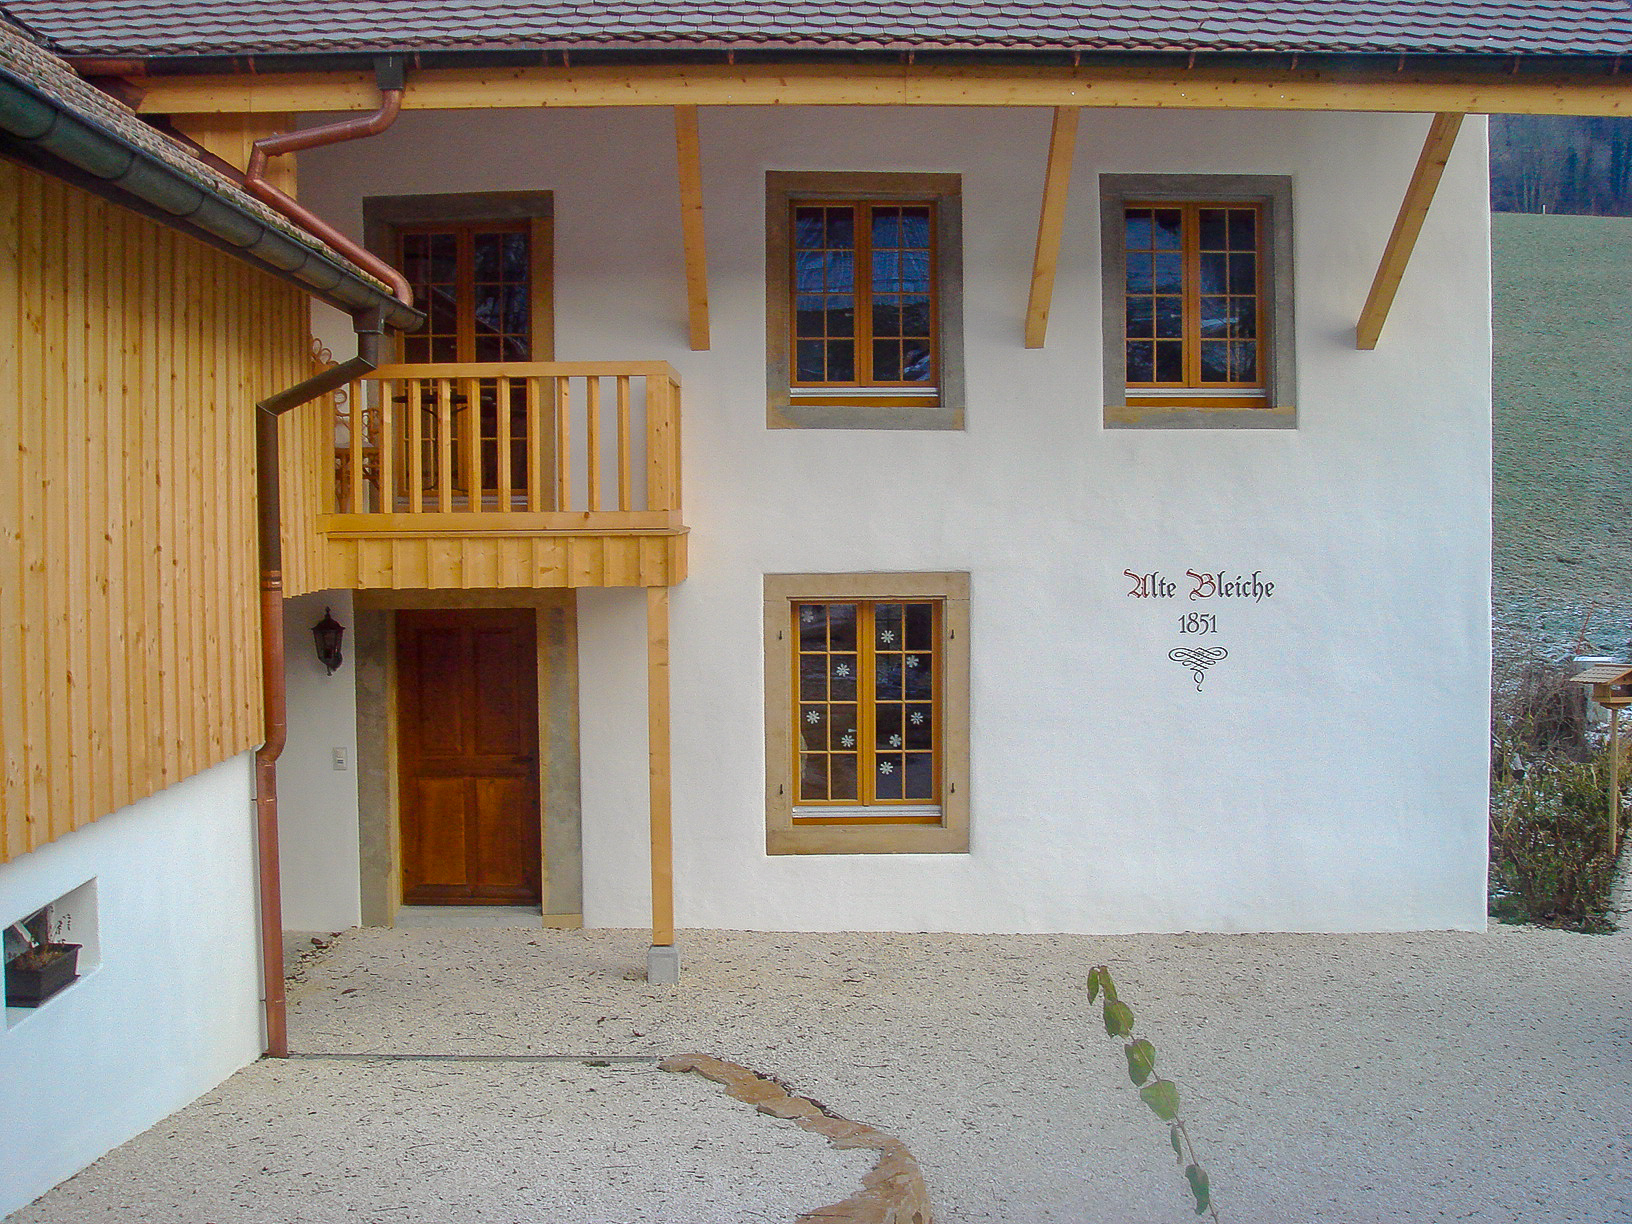 Einfamilienhaus rustikal